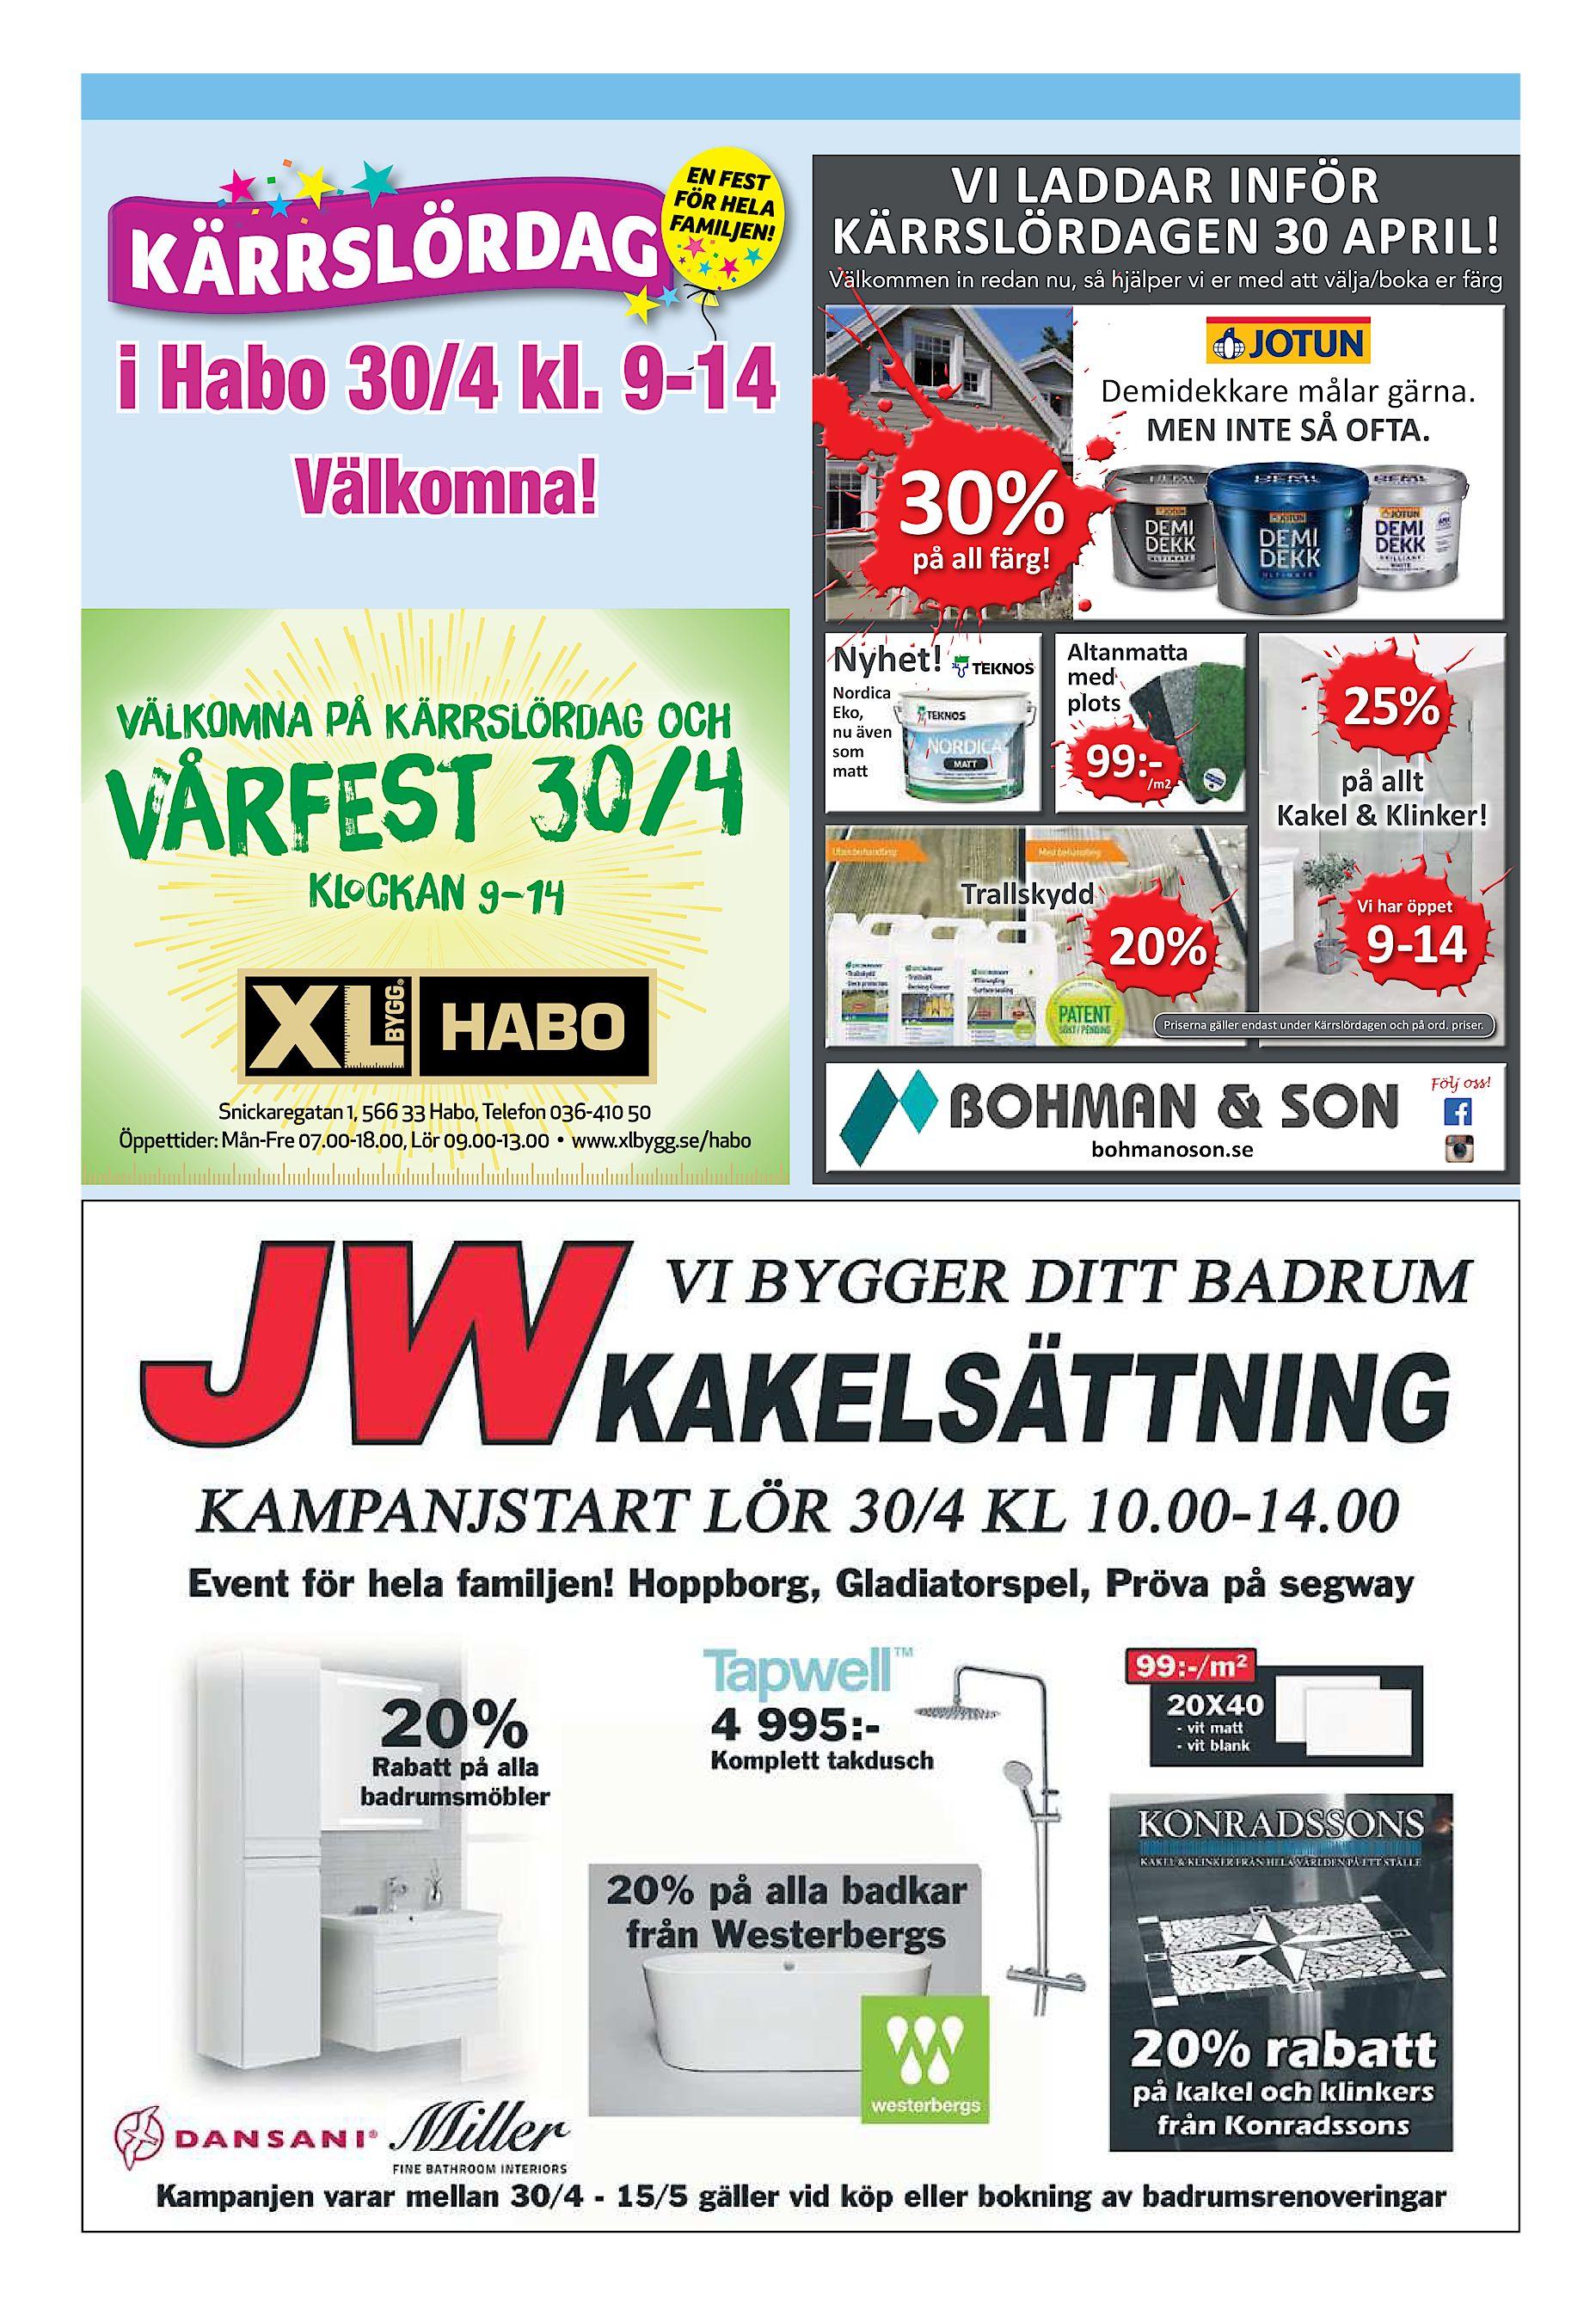 fc1dce278f5a Jönköping.nu JNU-20160428 (endast text)